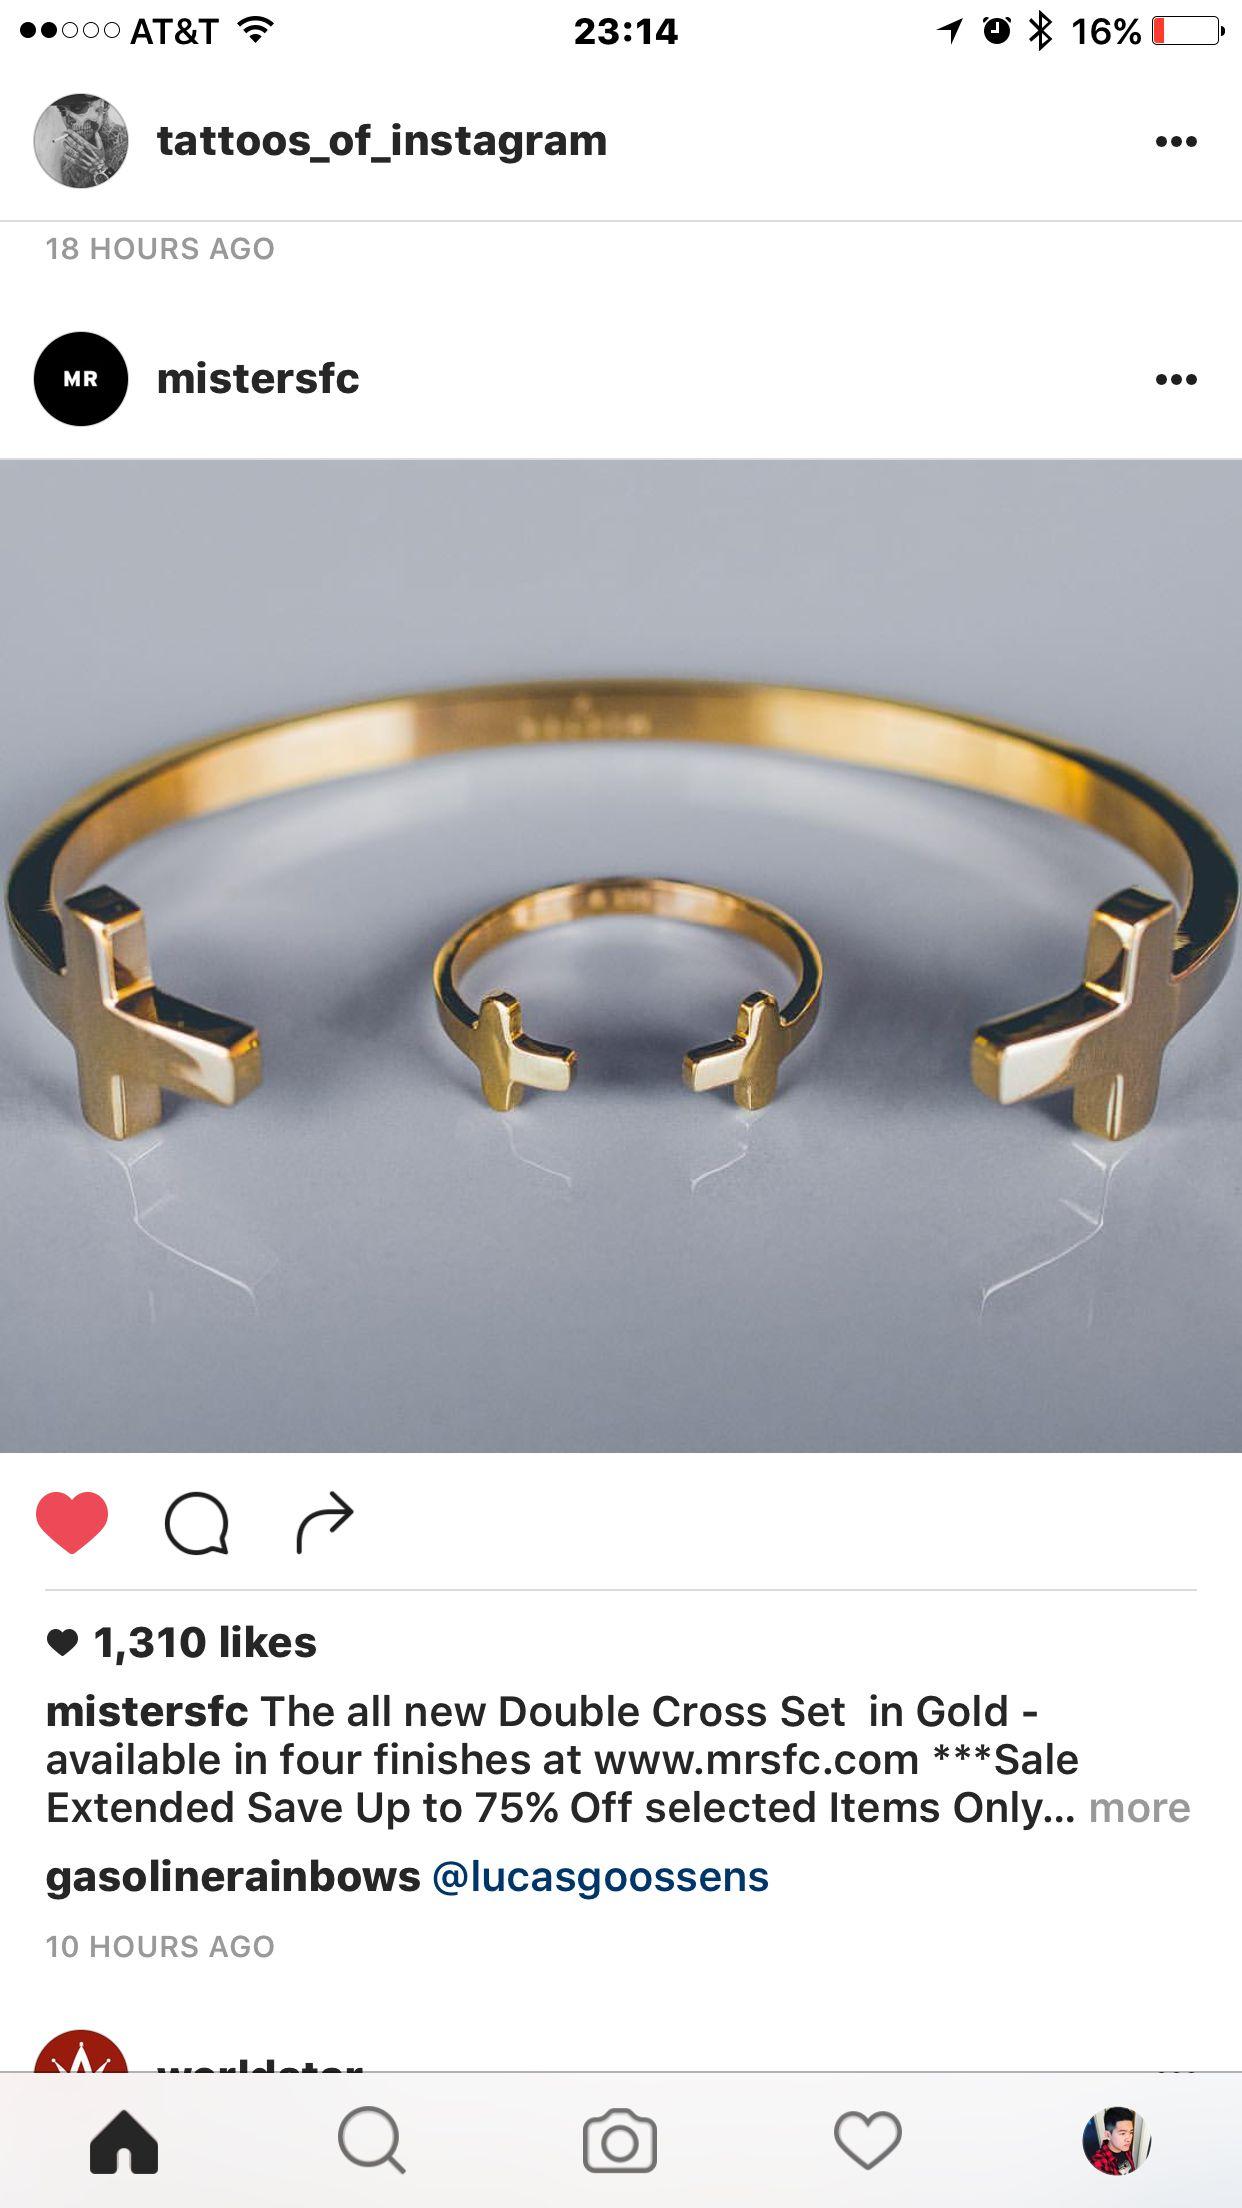 MRSFC - MISTER DOUBLE CROSS SET GOLD